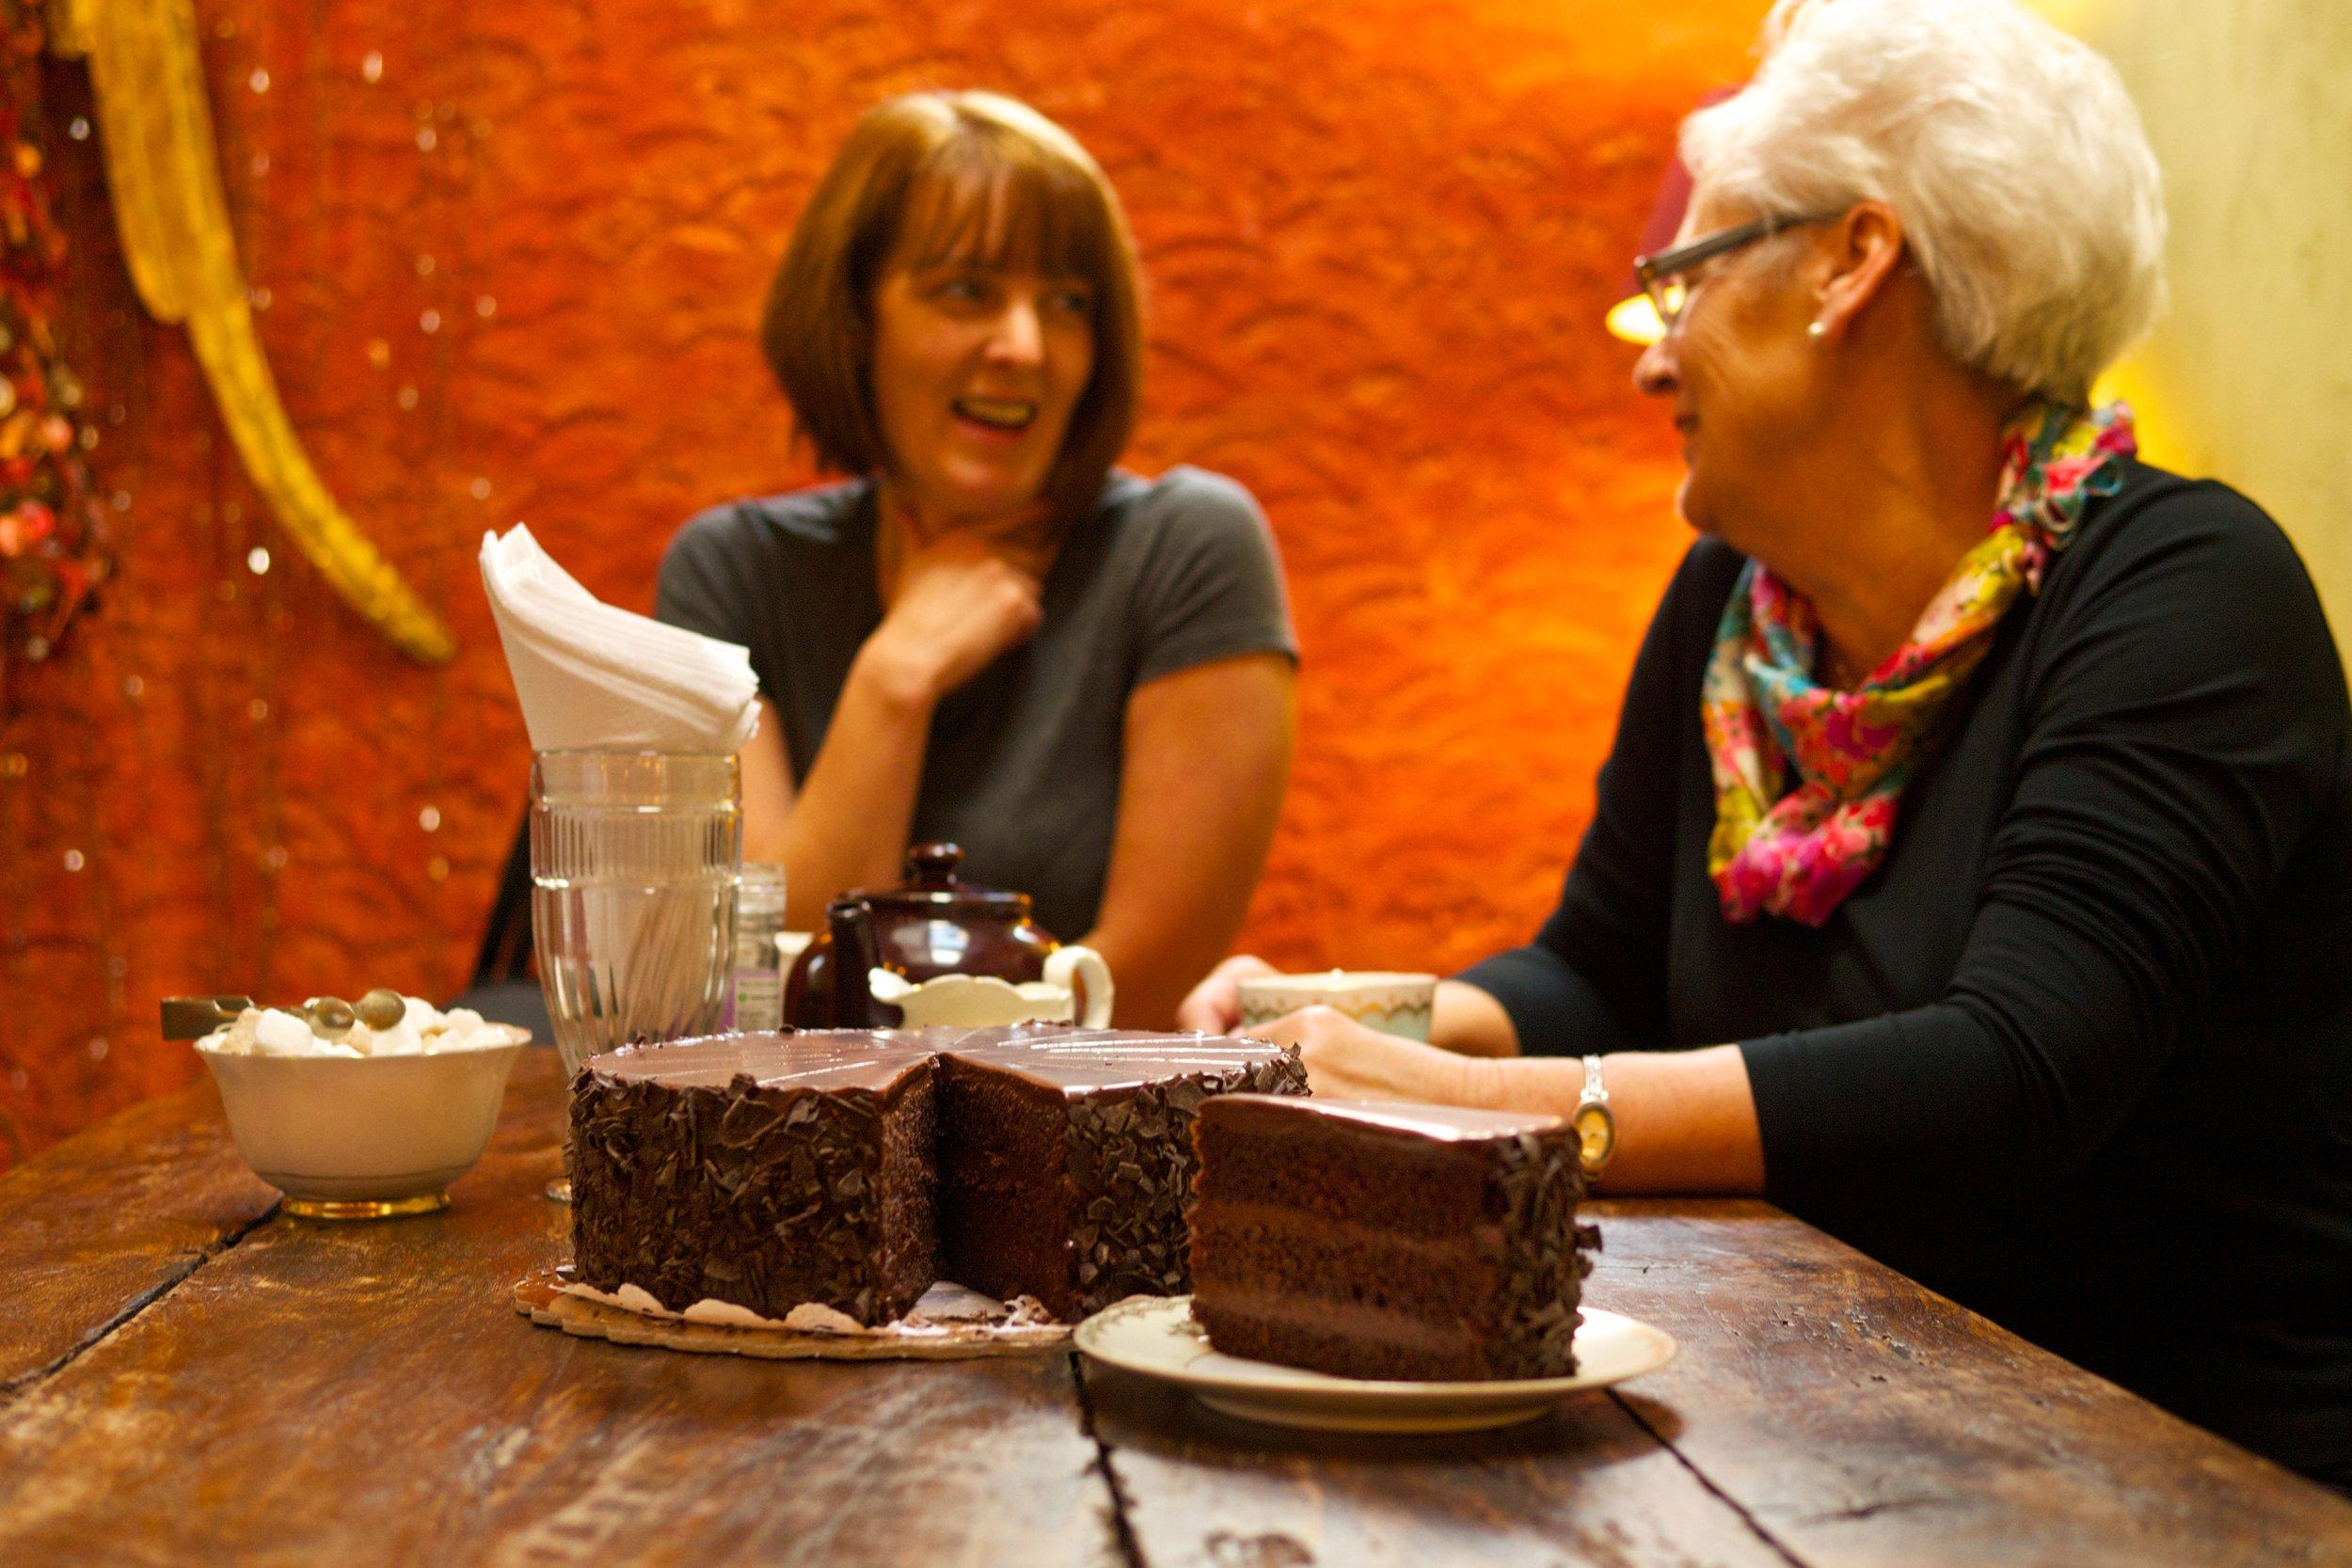 Cocoa Tree Cafe Famous Artisan Luxury Chocolate Cake, Pittenweem, East Neuk, Fife, Scotland.